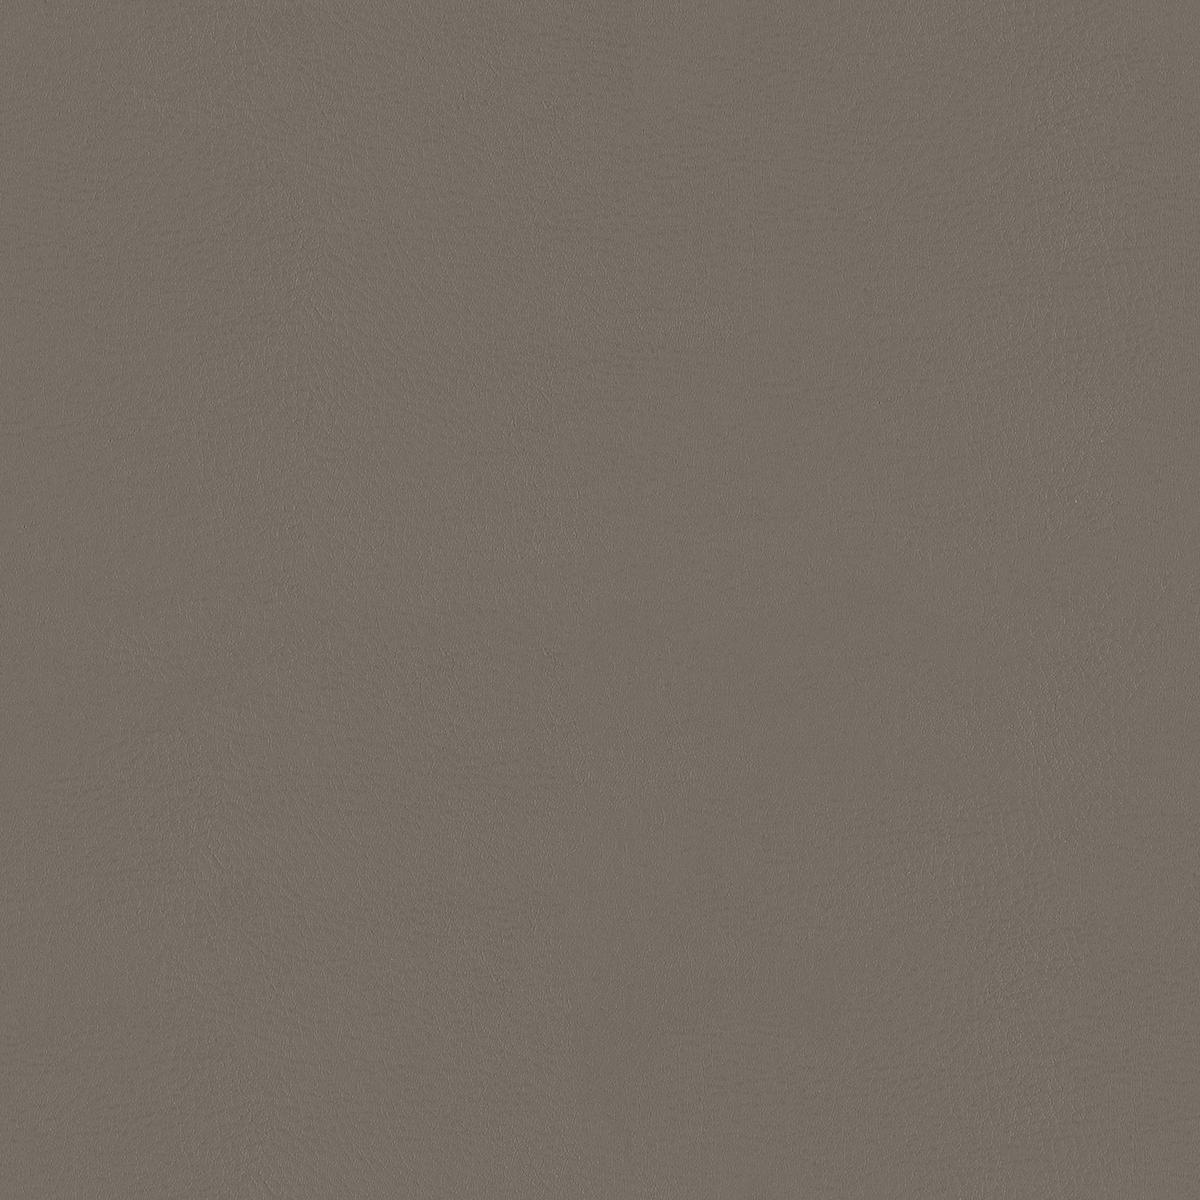 Top Coat - Seal - 4083 - 16 - Half Yard Tileable Swatches